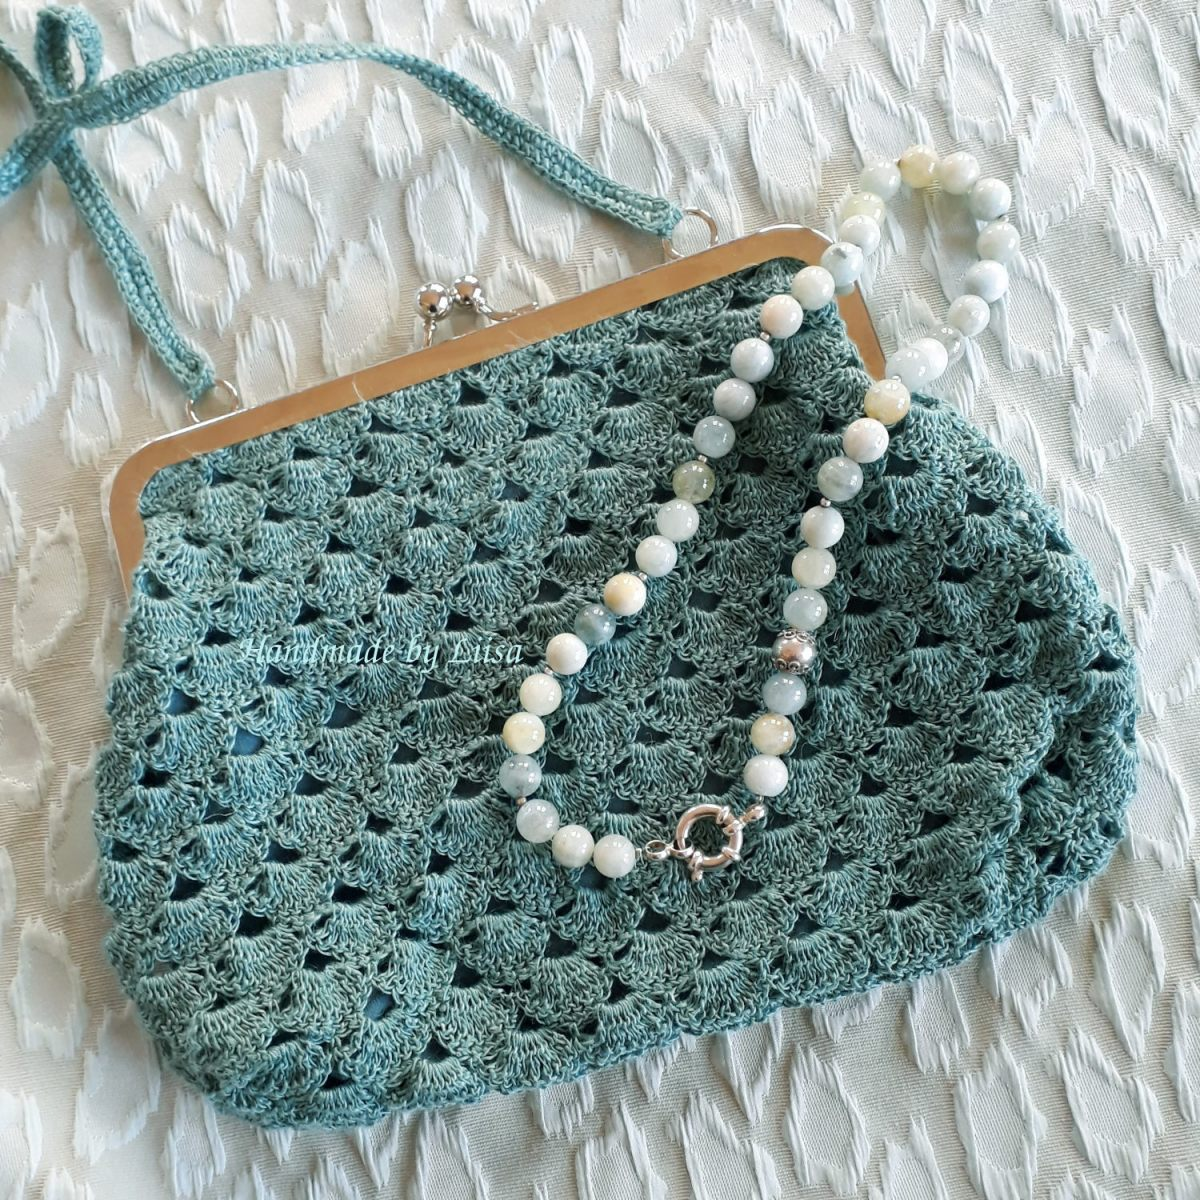 Crocheted purses, virkattuja pikkulaukkuja